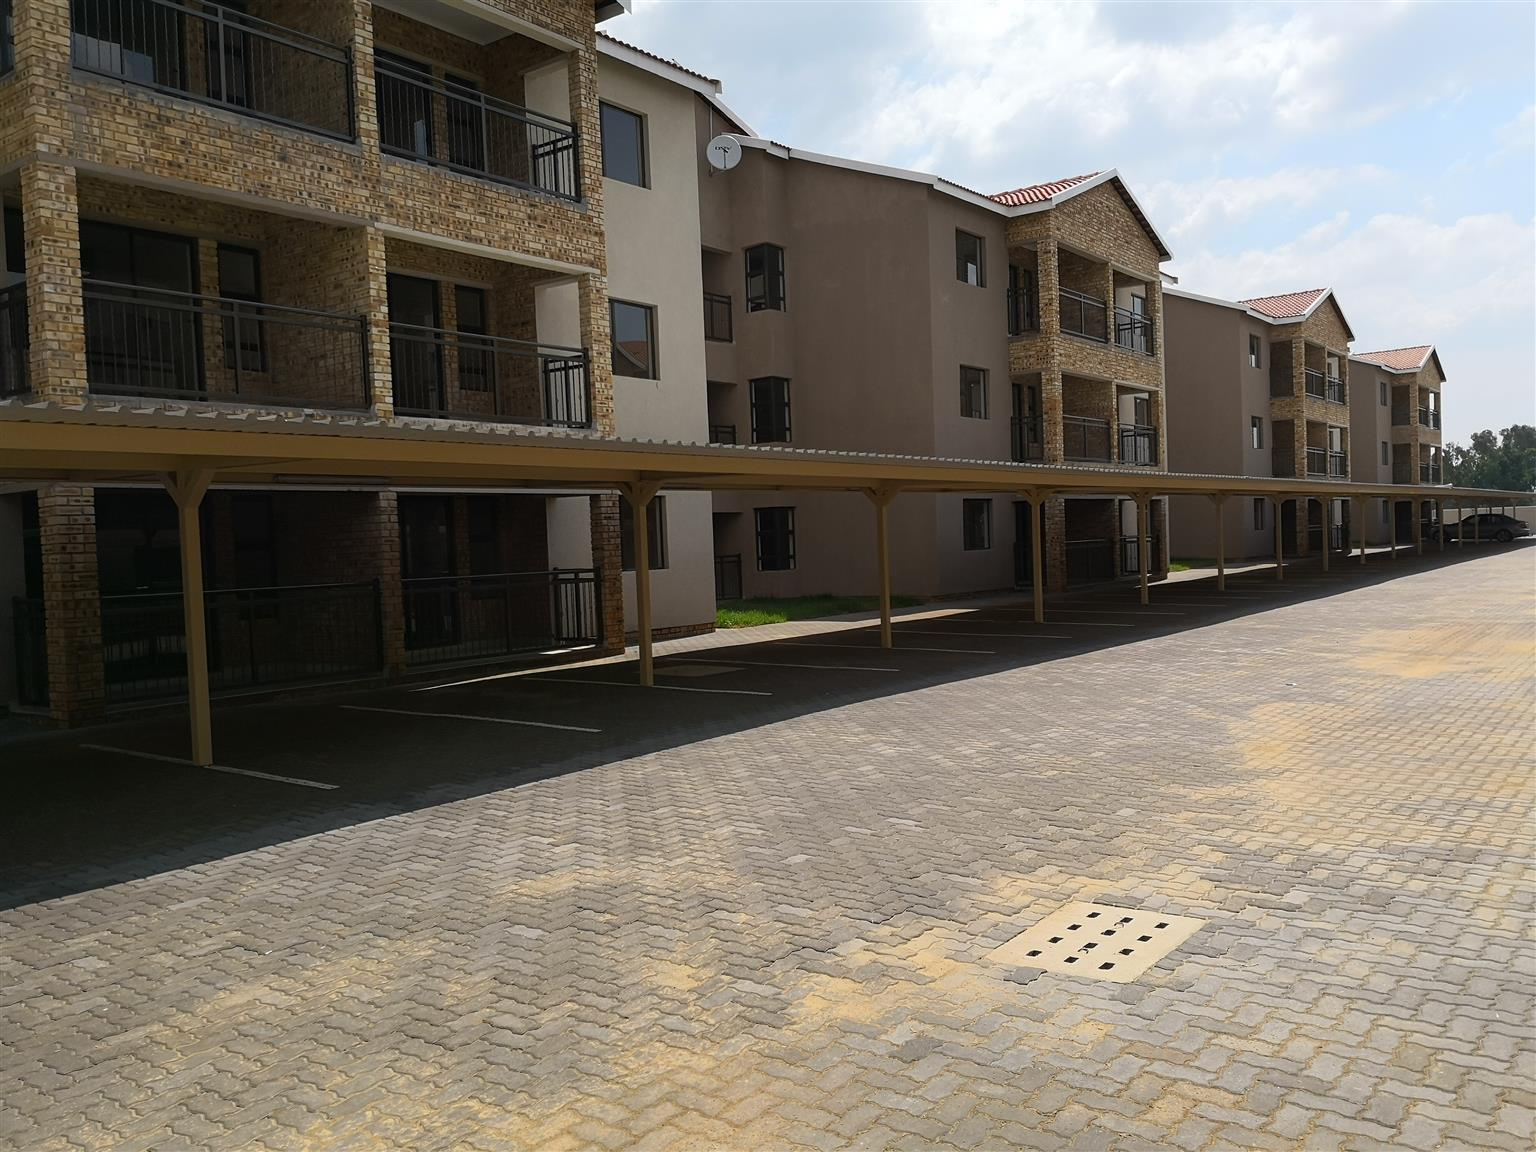 NEW DEVELOPMENT 2 BEDROOM APARTMENTS FOR SALE - BRENTWOOD PARK/POMONA